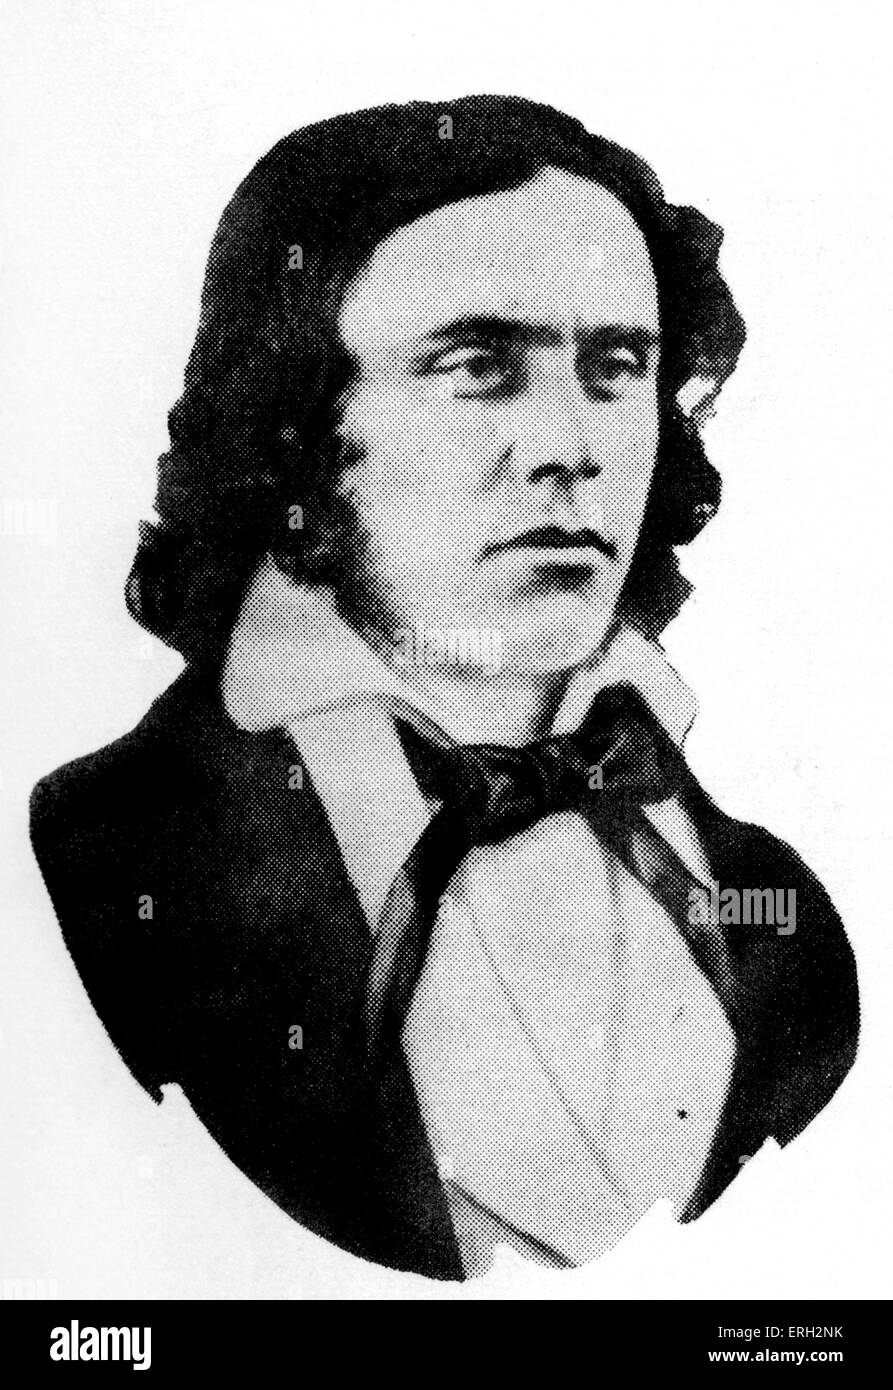 Richard Henry Dana Jr., US-amerikanischer Jurist und Politiker. 1. August 1815 - 6. Januar 1882. Stockbild